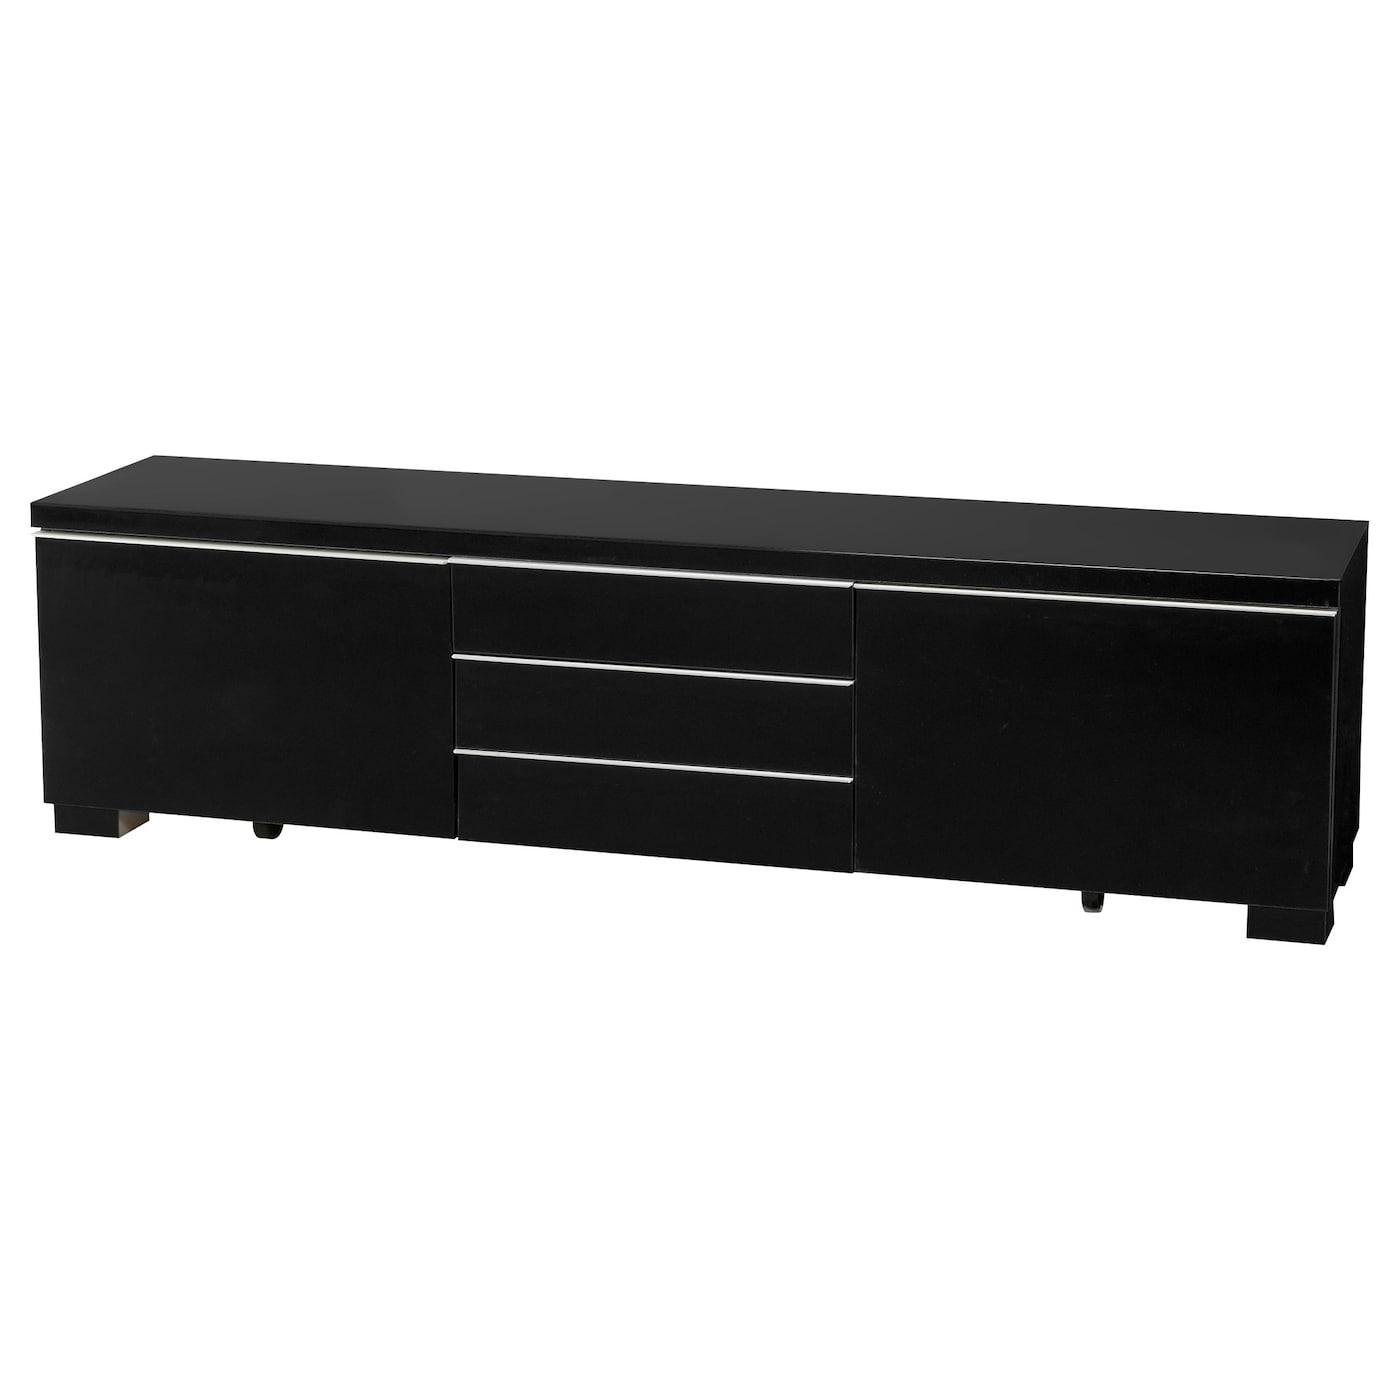 Ikea Besta Burs Tv Bank Rot Edelos Com Inspiration Design F R  # Ikea Meuble Tv Besta Burs